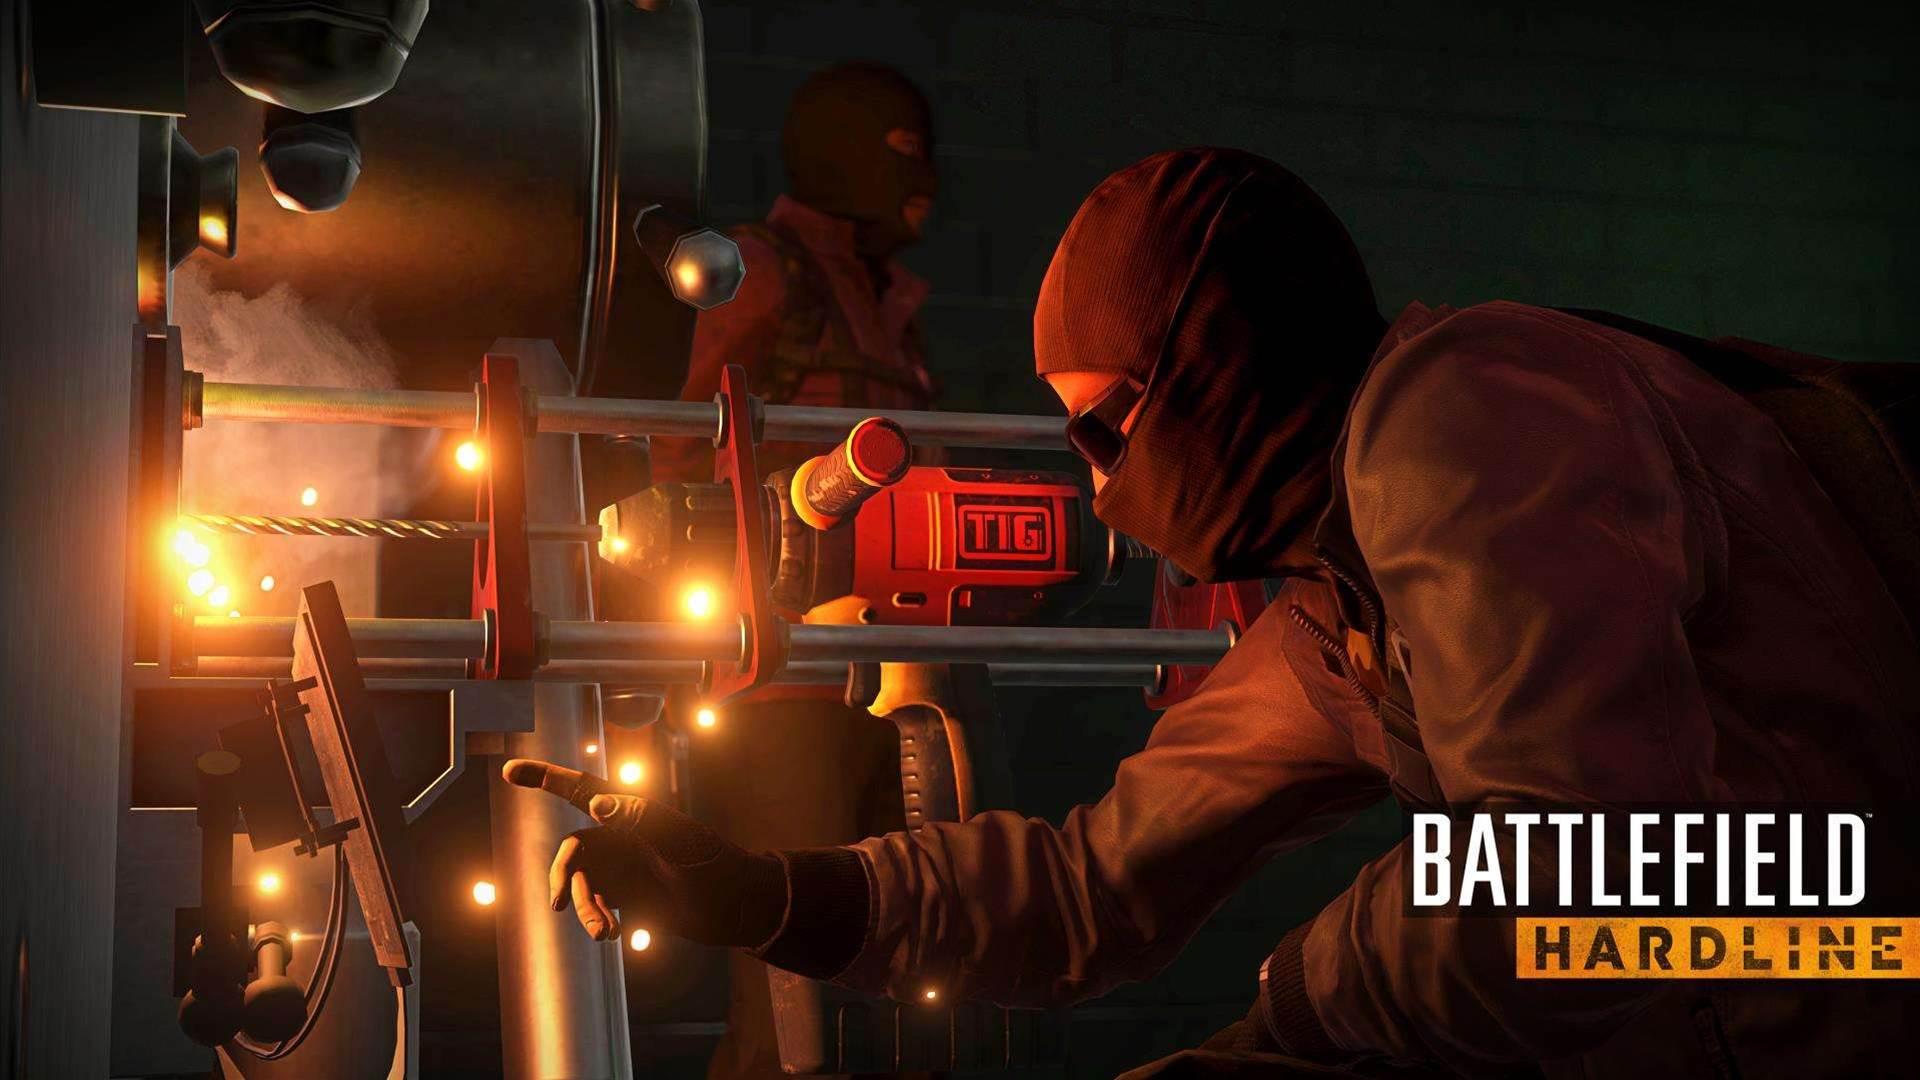 Battlefield Hardline launch screens